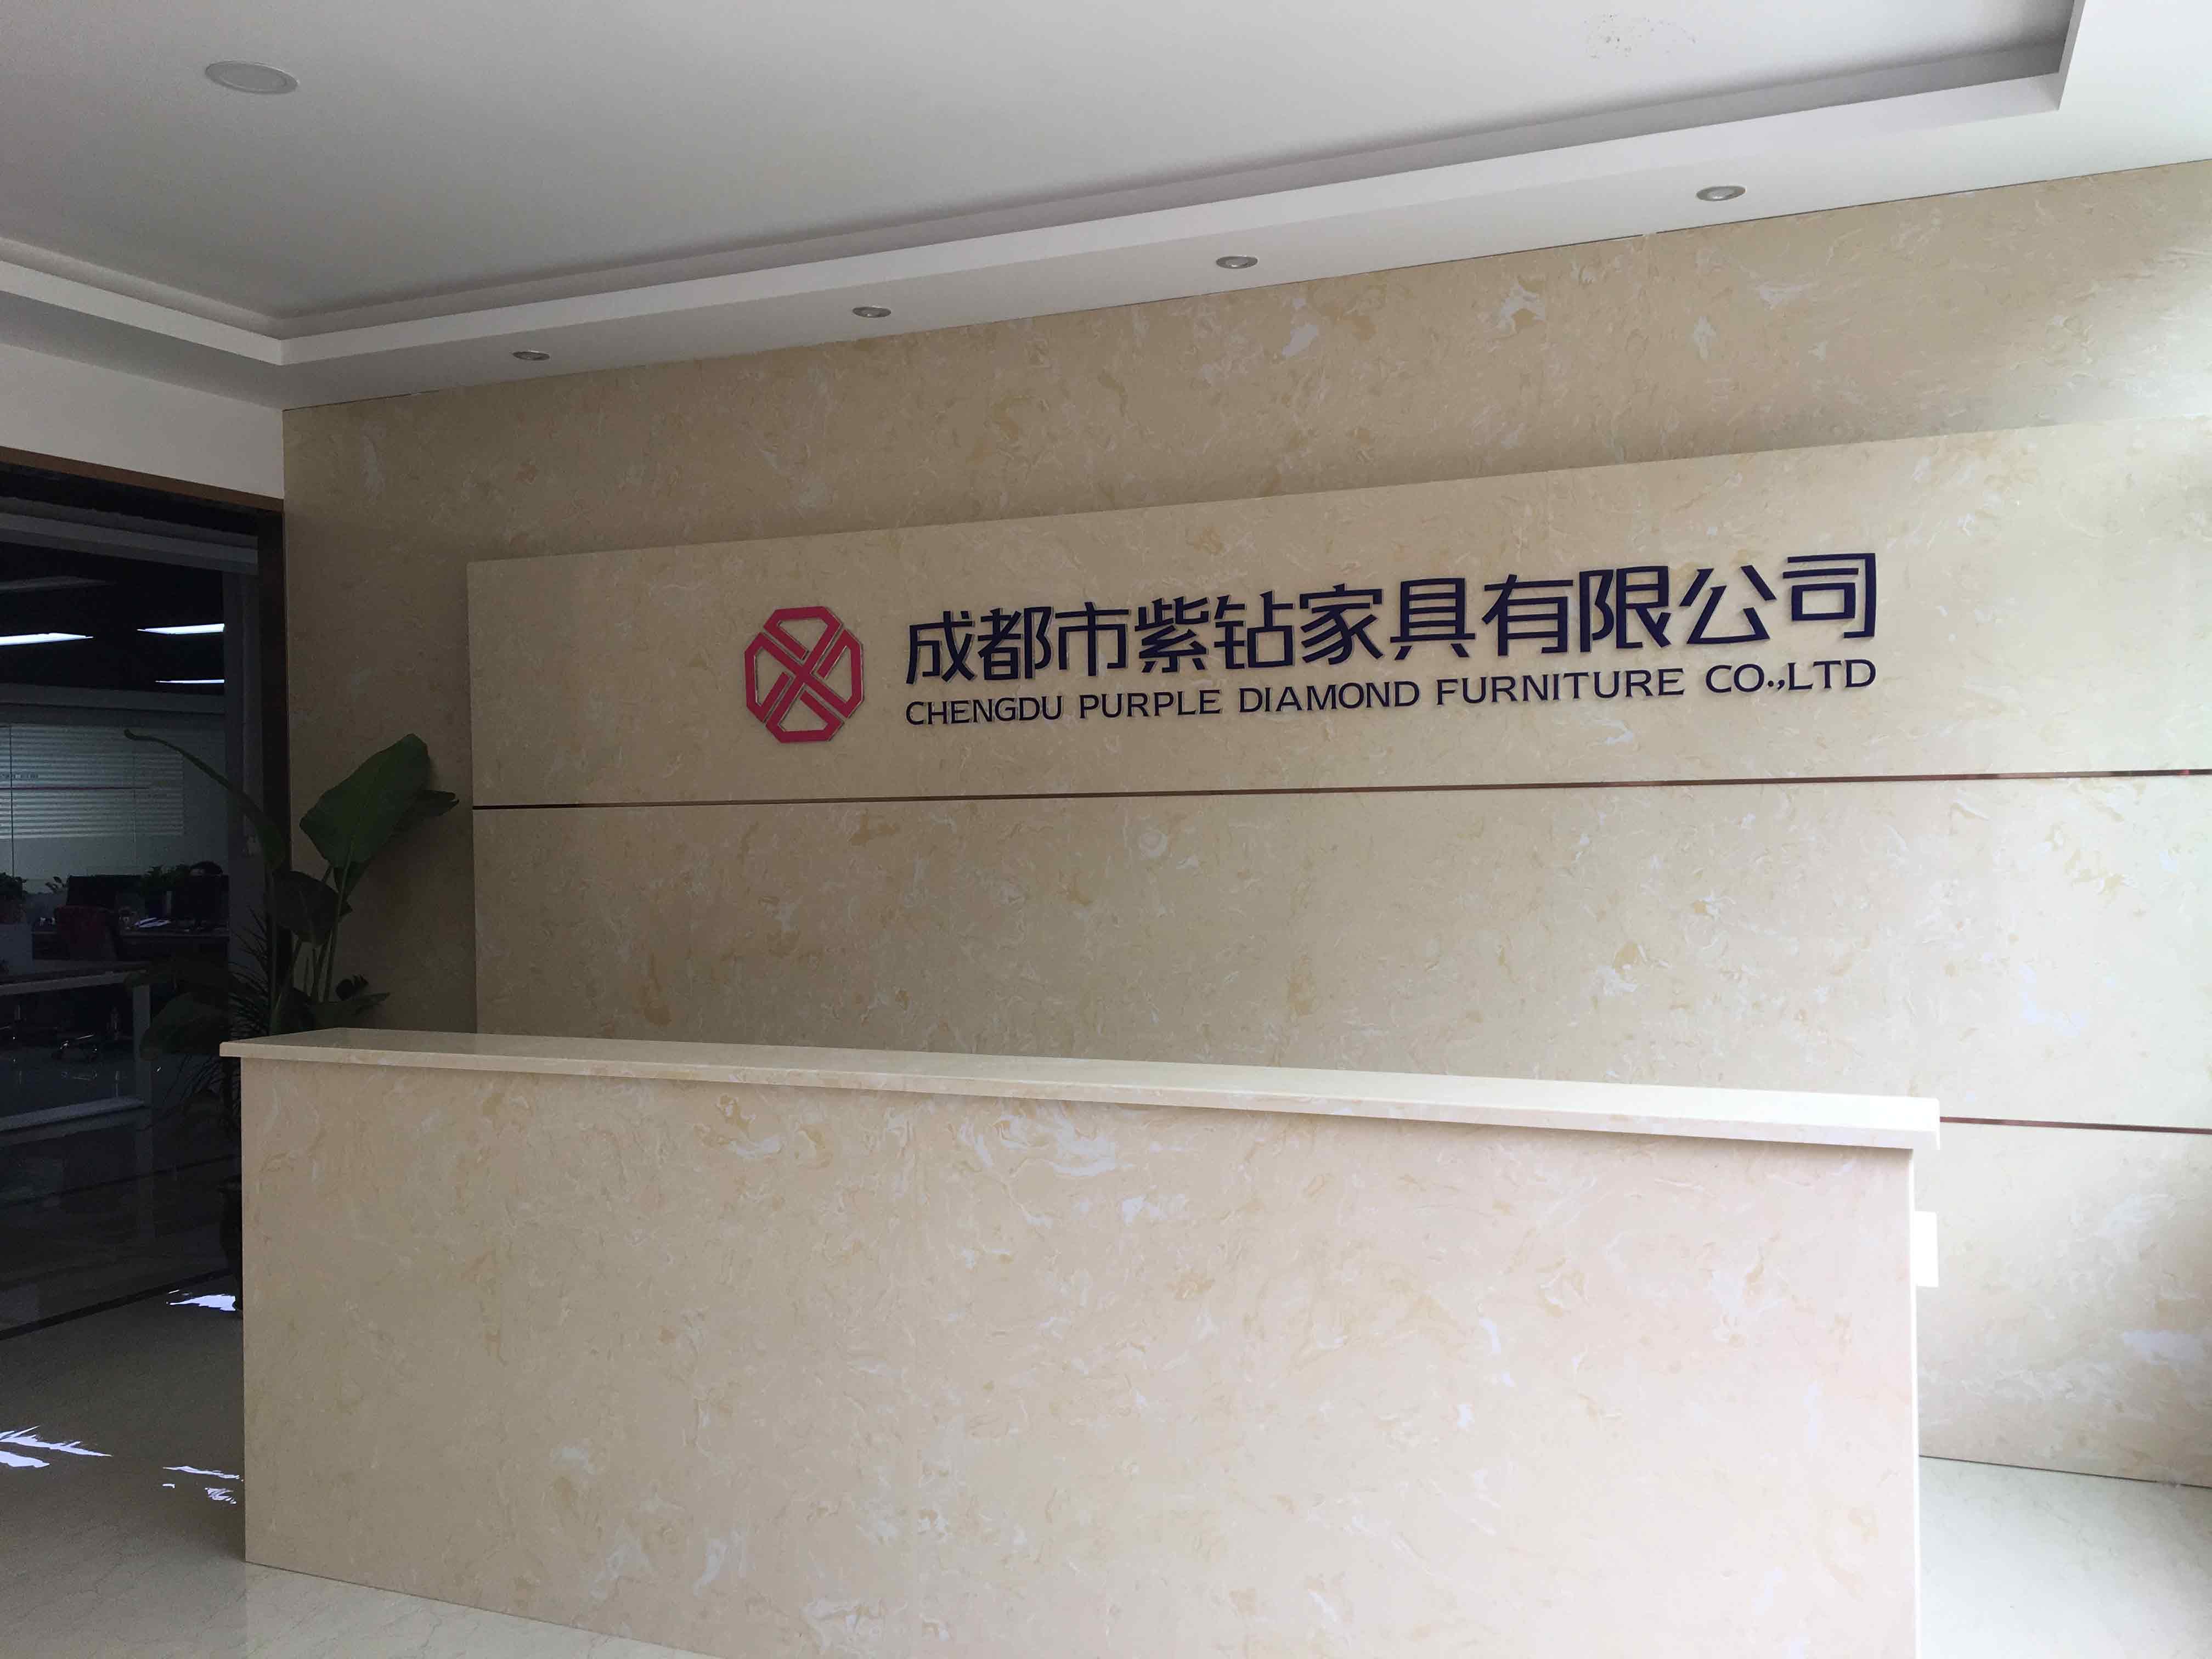 wohnzimmermobel royal oak : Chengdu Purple Diamond Furniture Co Ltd Dining Table Dining Chair